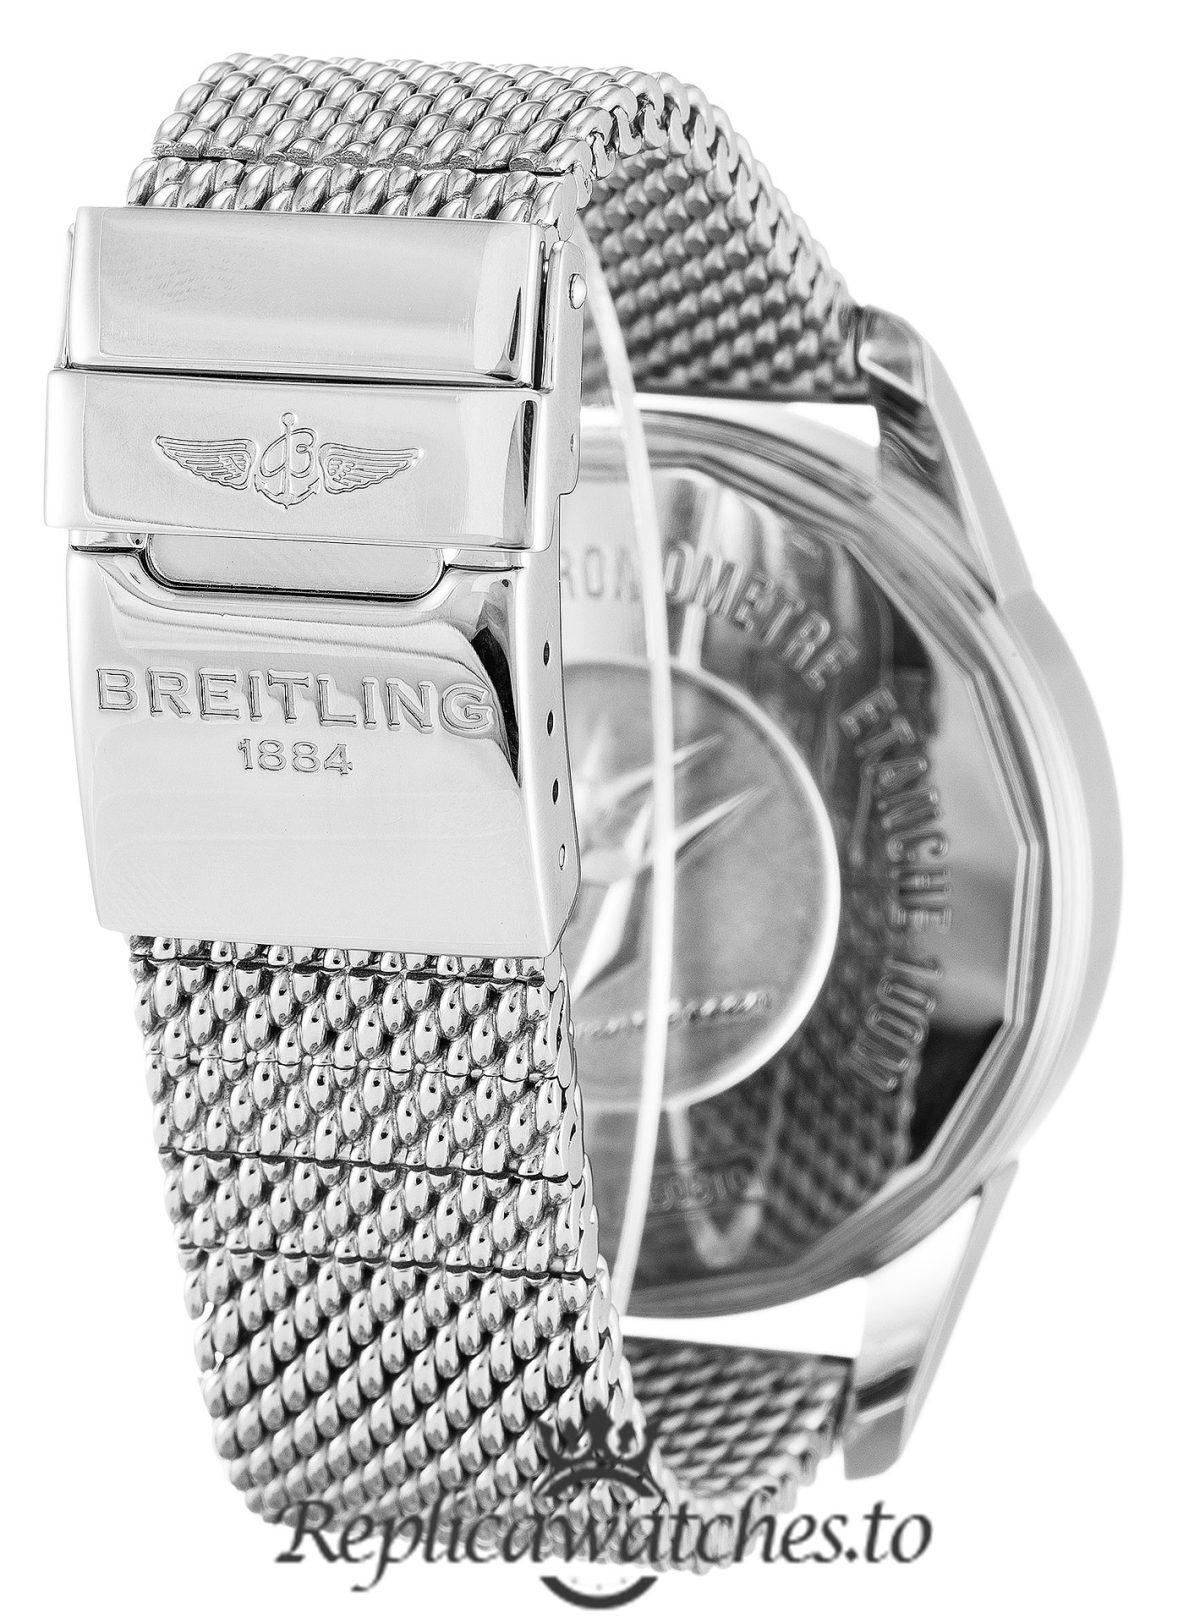 Breitling Transocean Chronograph Replica AB0510 002 Black Dial 46MM